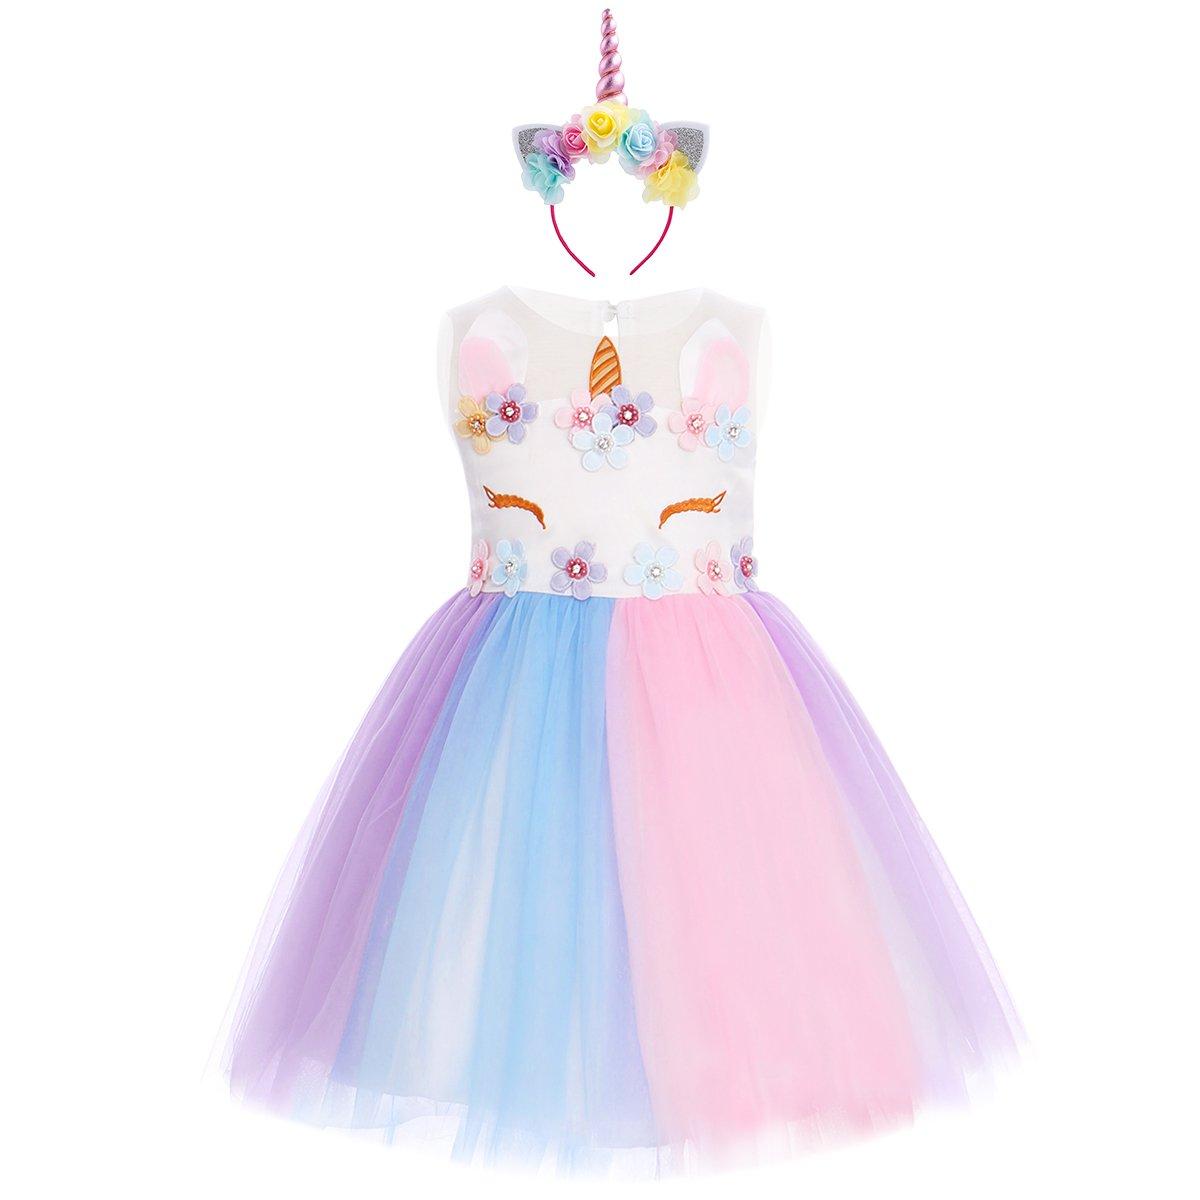 756ecdb326 FYMNSI Kids Girls Unicorn Costume Cosplay Dress Birthday Party Outfit  Halloween Fancy Dress Up Princess Rainbow Tutu Tulle Skirt for Festival  Performance ...